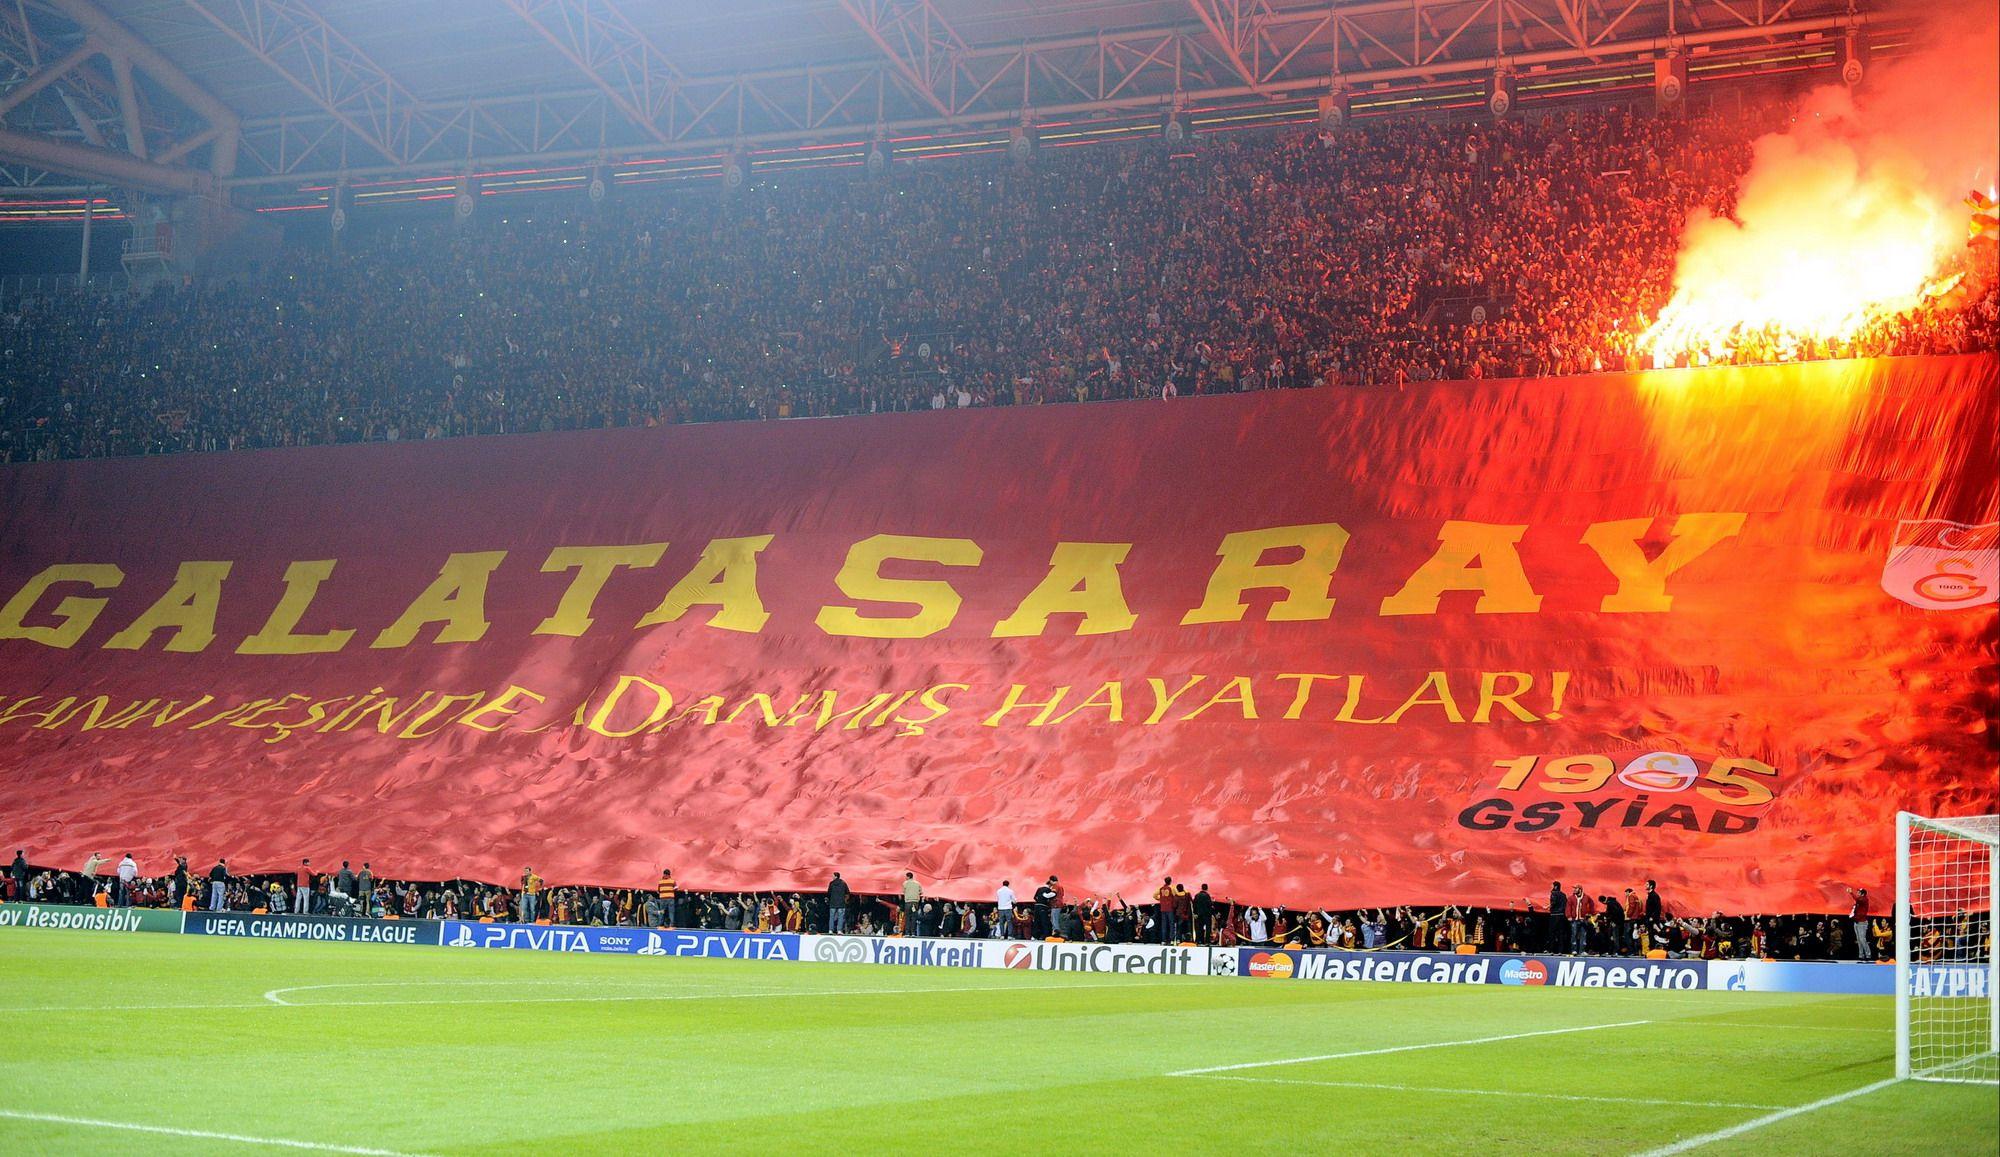 Ставки на футбол на Галатасарай – Коньяспор. Ставки на чемпионат Турции 3 Июня 2017